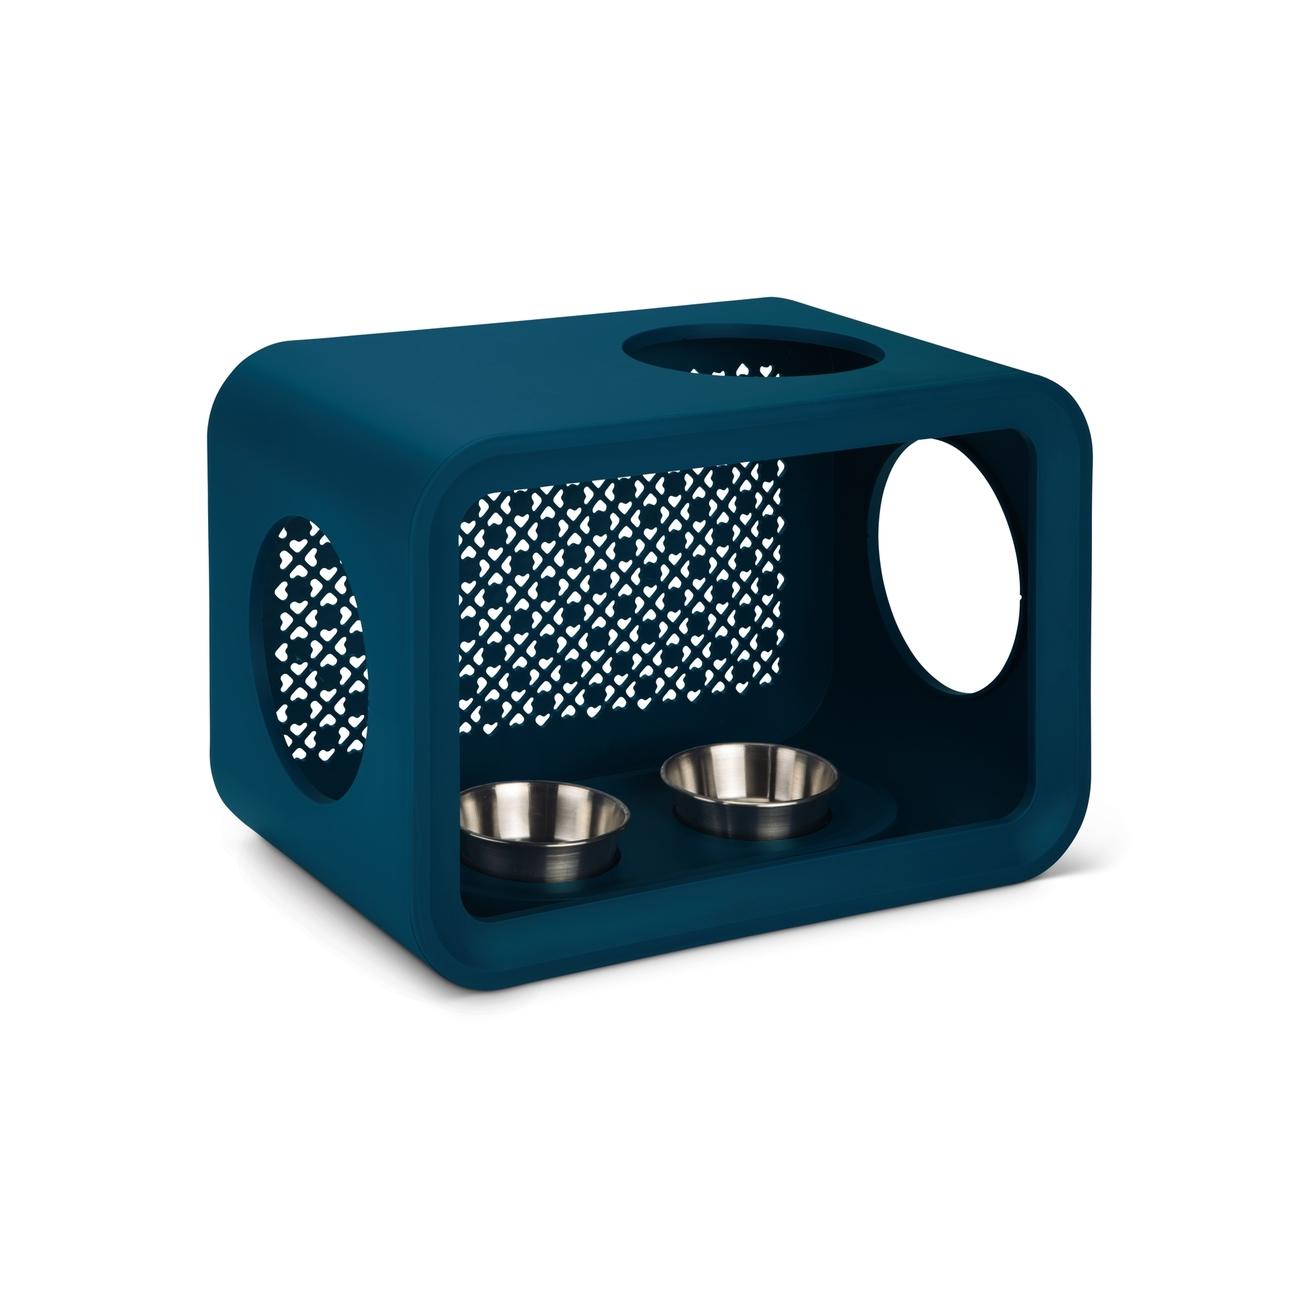 Домик для кошек Beeztees Дом-Куб обеденный стол, синий, 49x33x29см фото